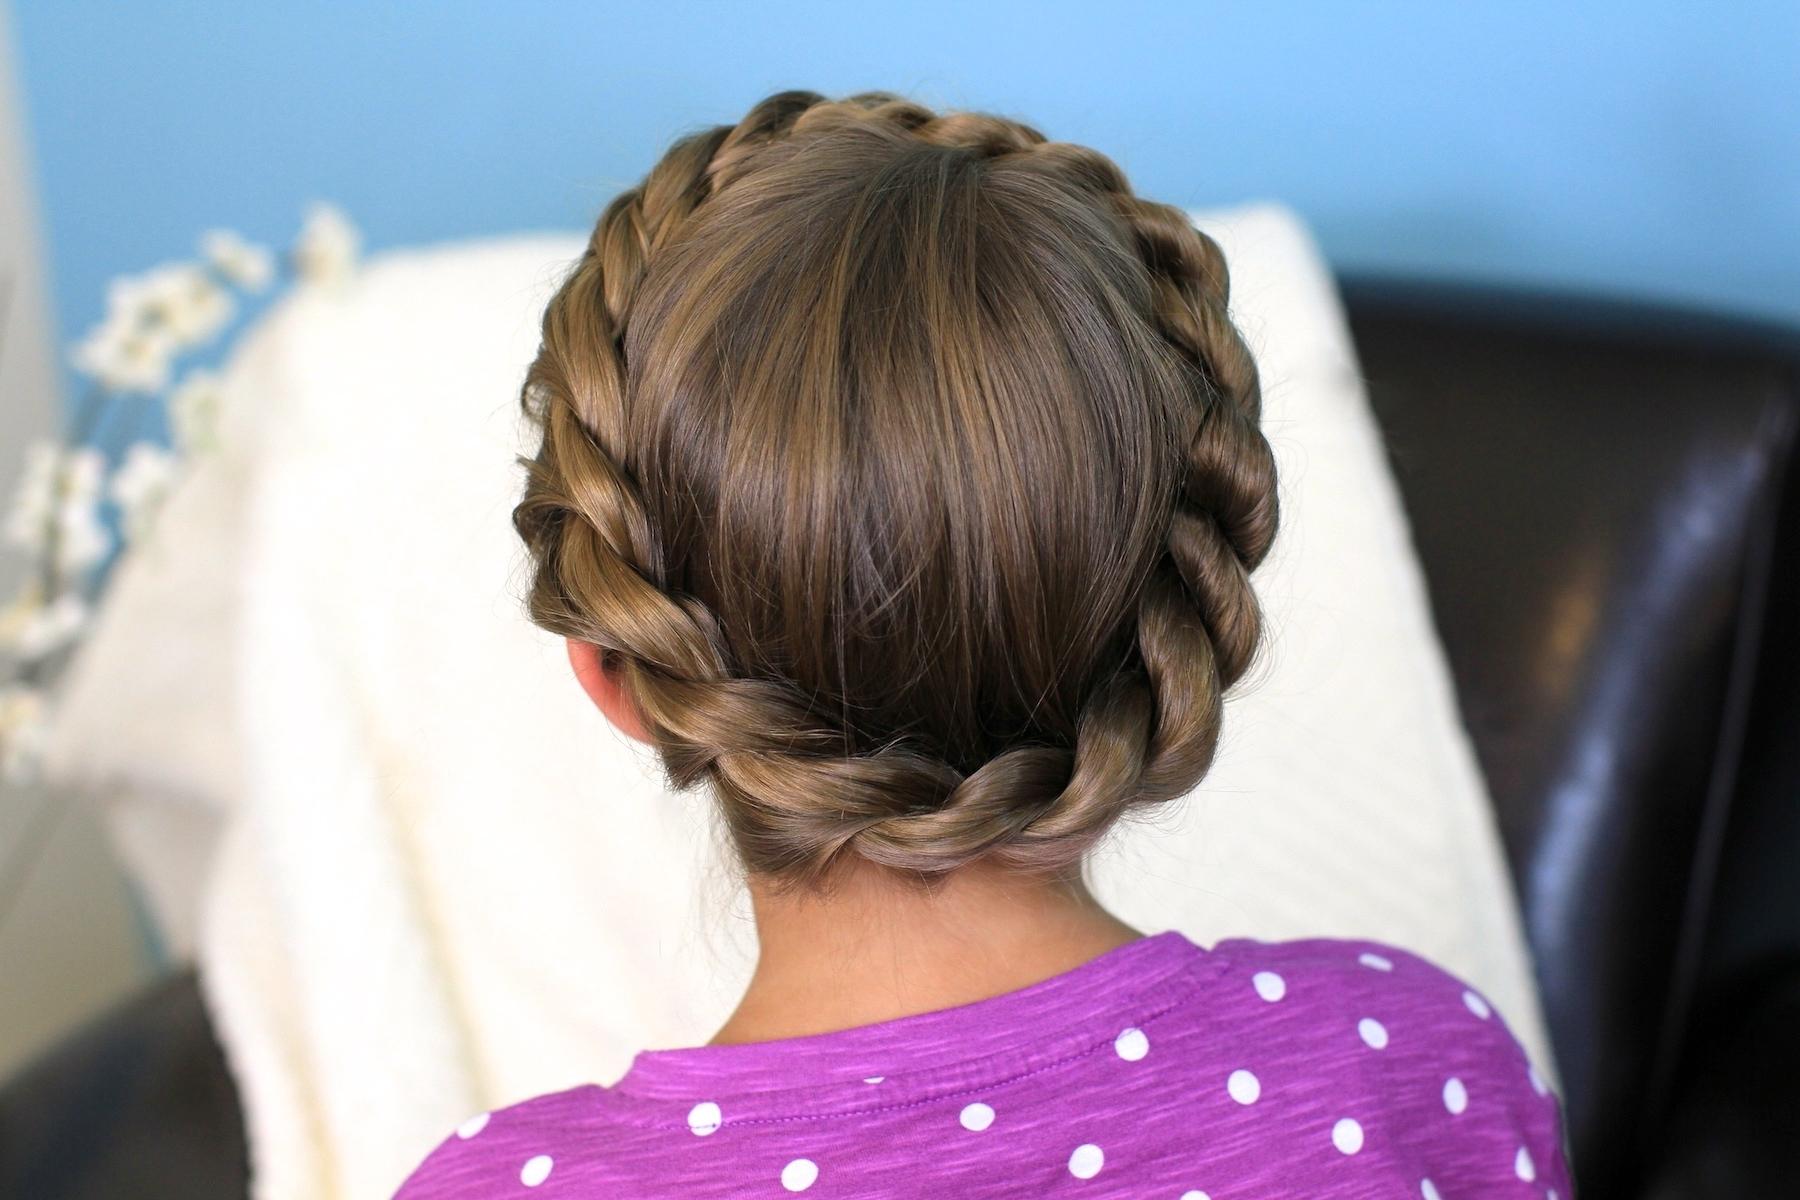 Crown Rope Twist Braid | Updo Hairstyles | Cute Girls Hairstyles Pertaining To Easy Updo Hairstyles For Kids (View 5 of 15)